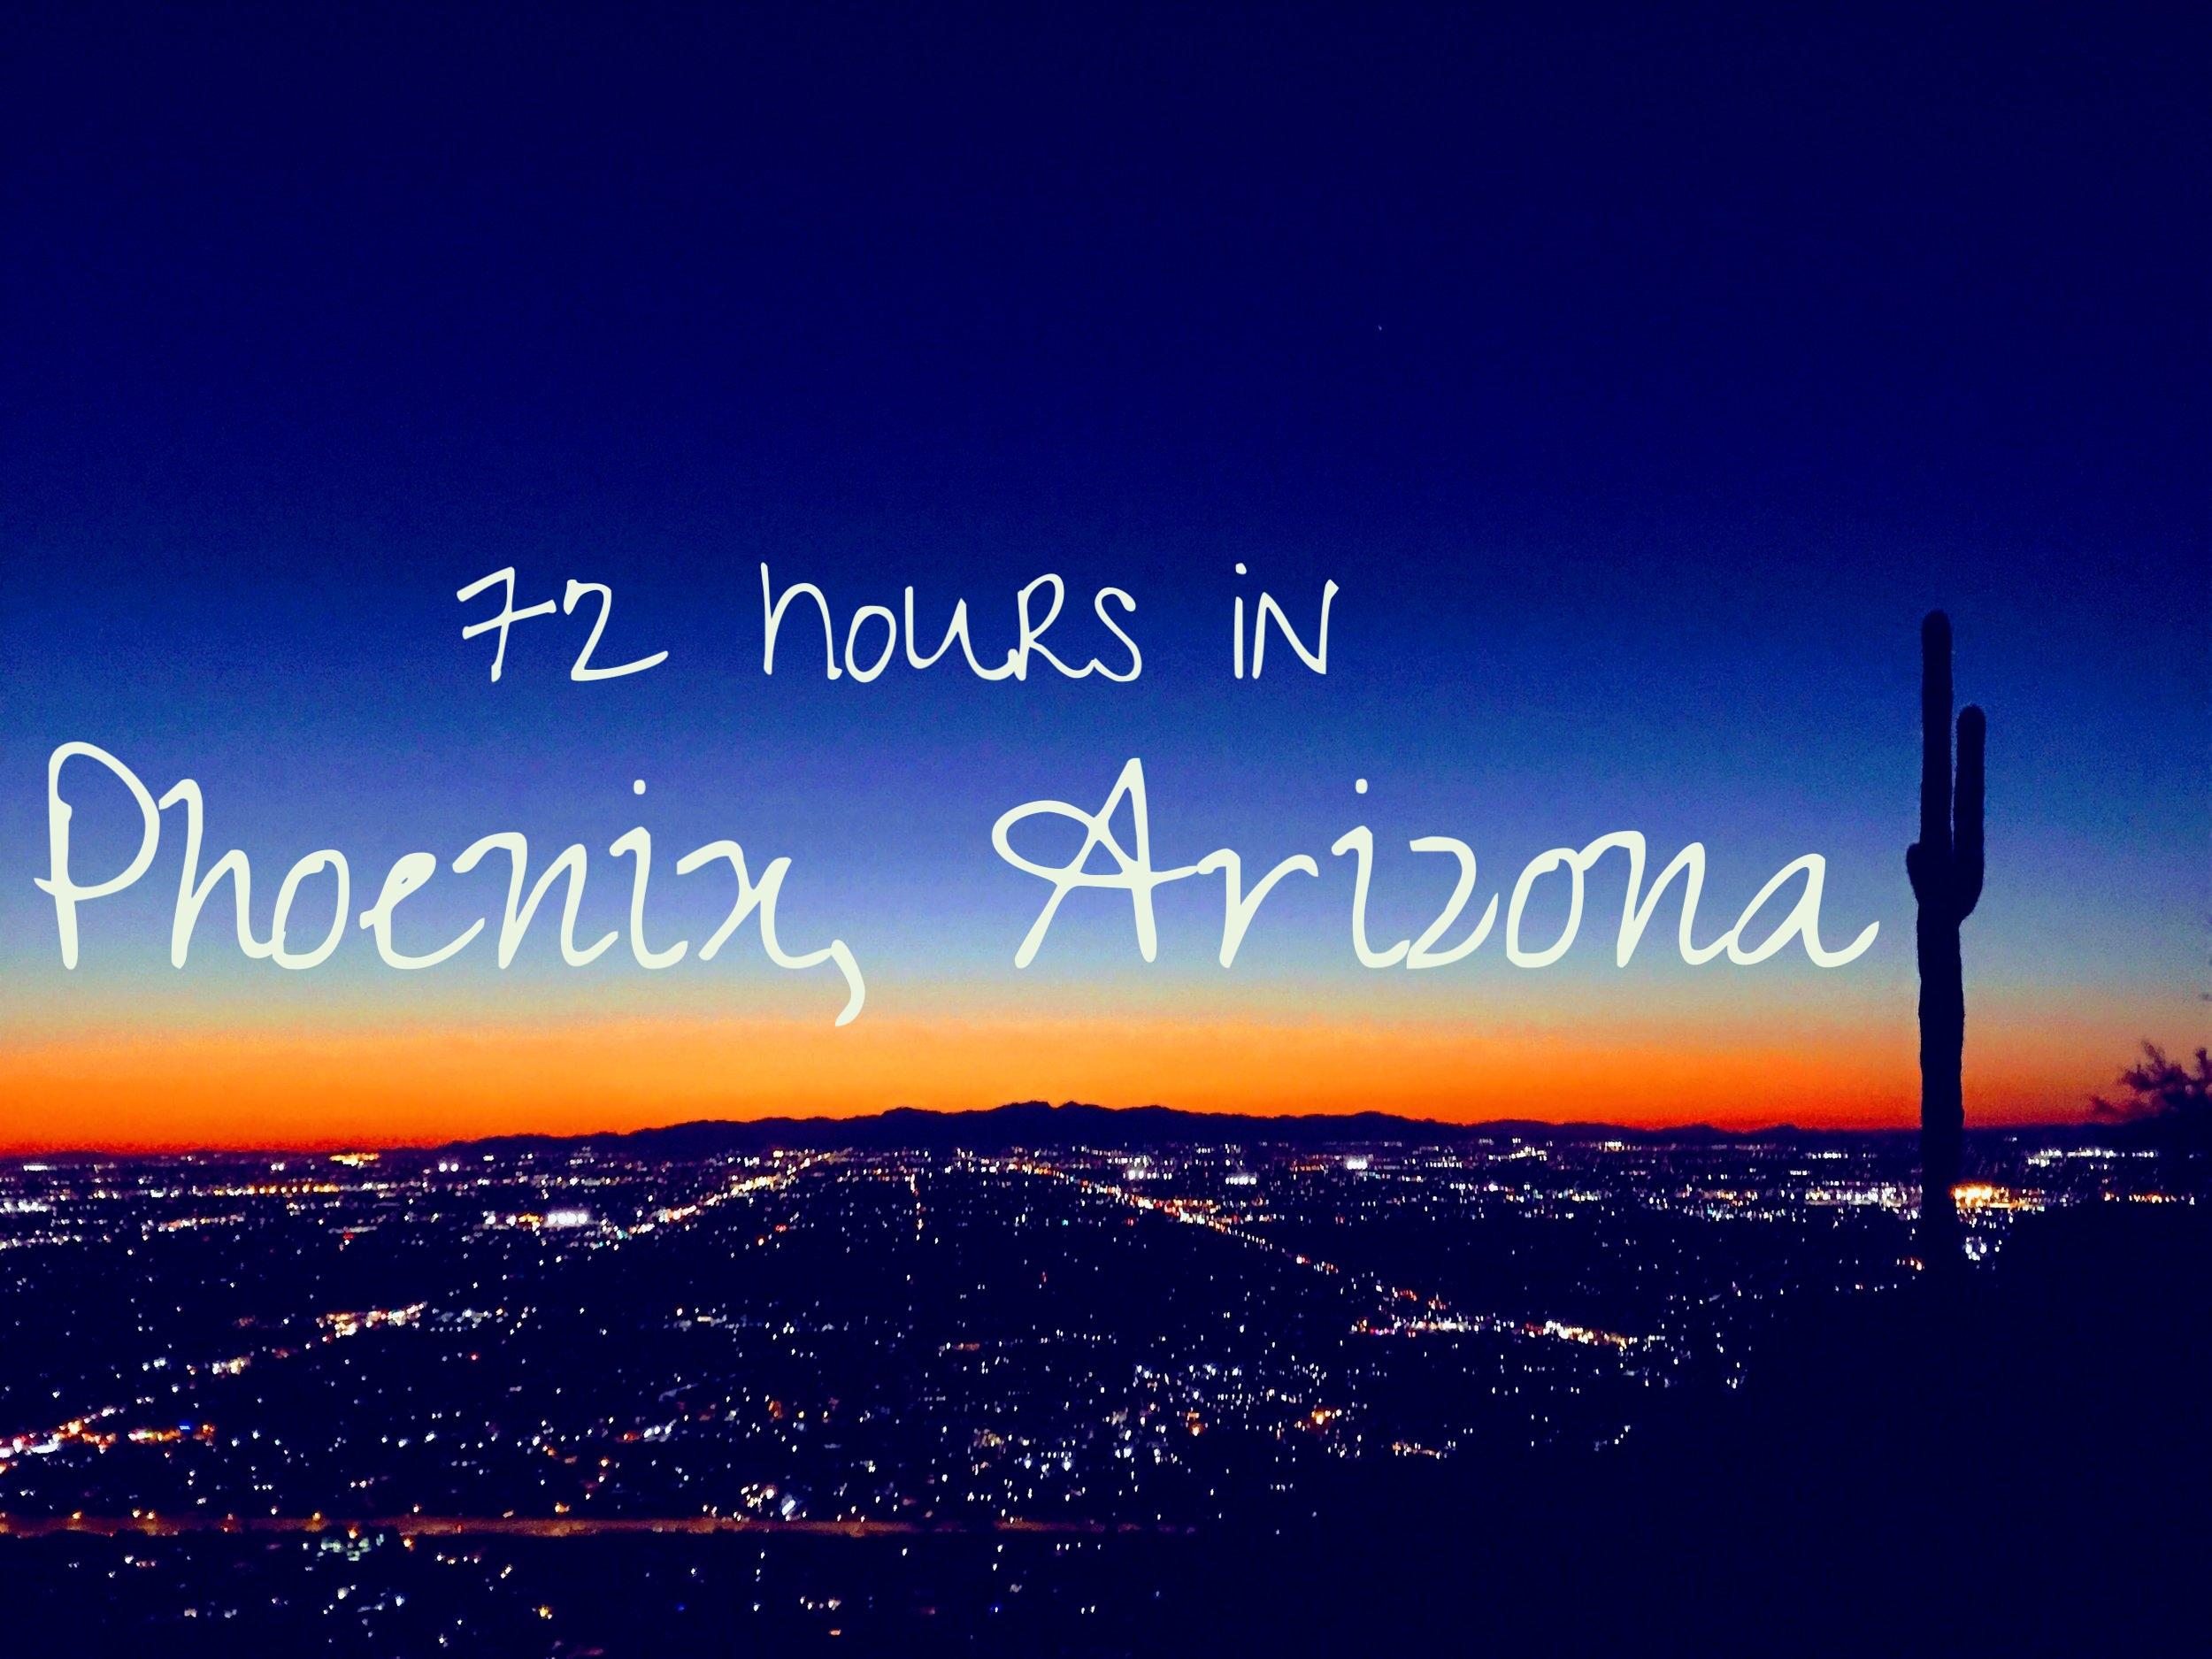 72 hours in Phoenix Arizona - microtomacro